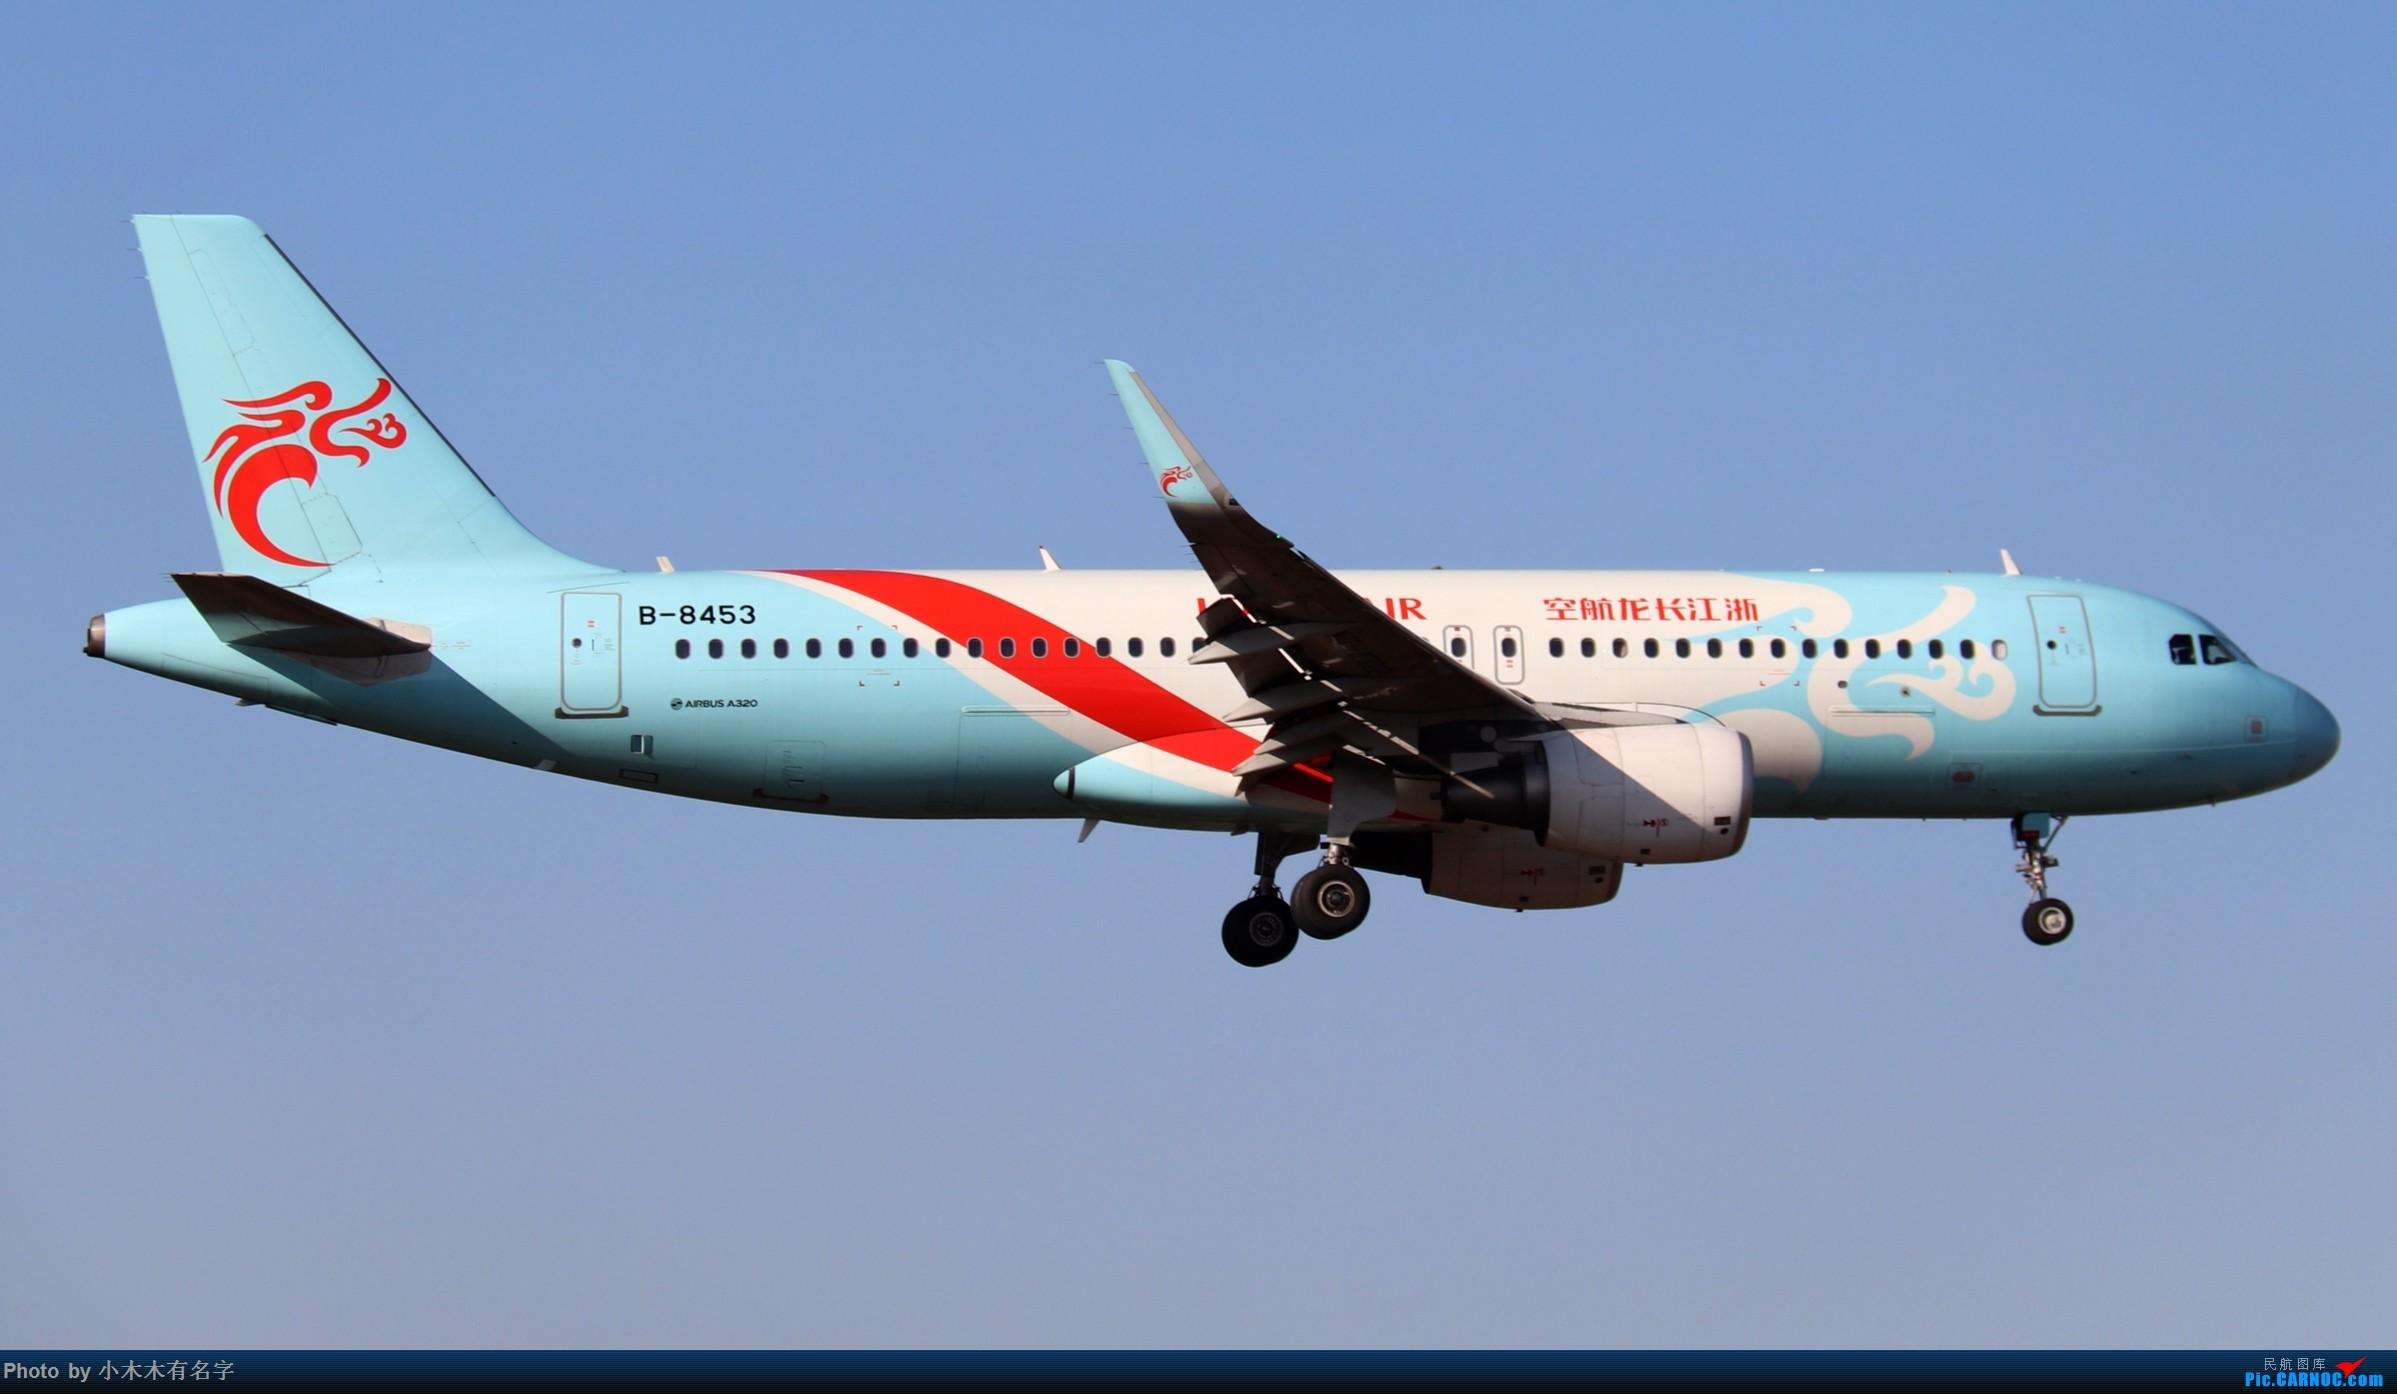 Re:[原创]2019冬天的海口美兰 AIRBUS A320-200 B-8453 中国海口美兰国际机场